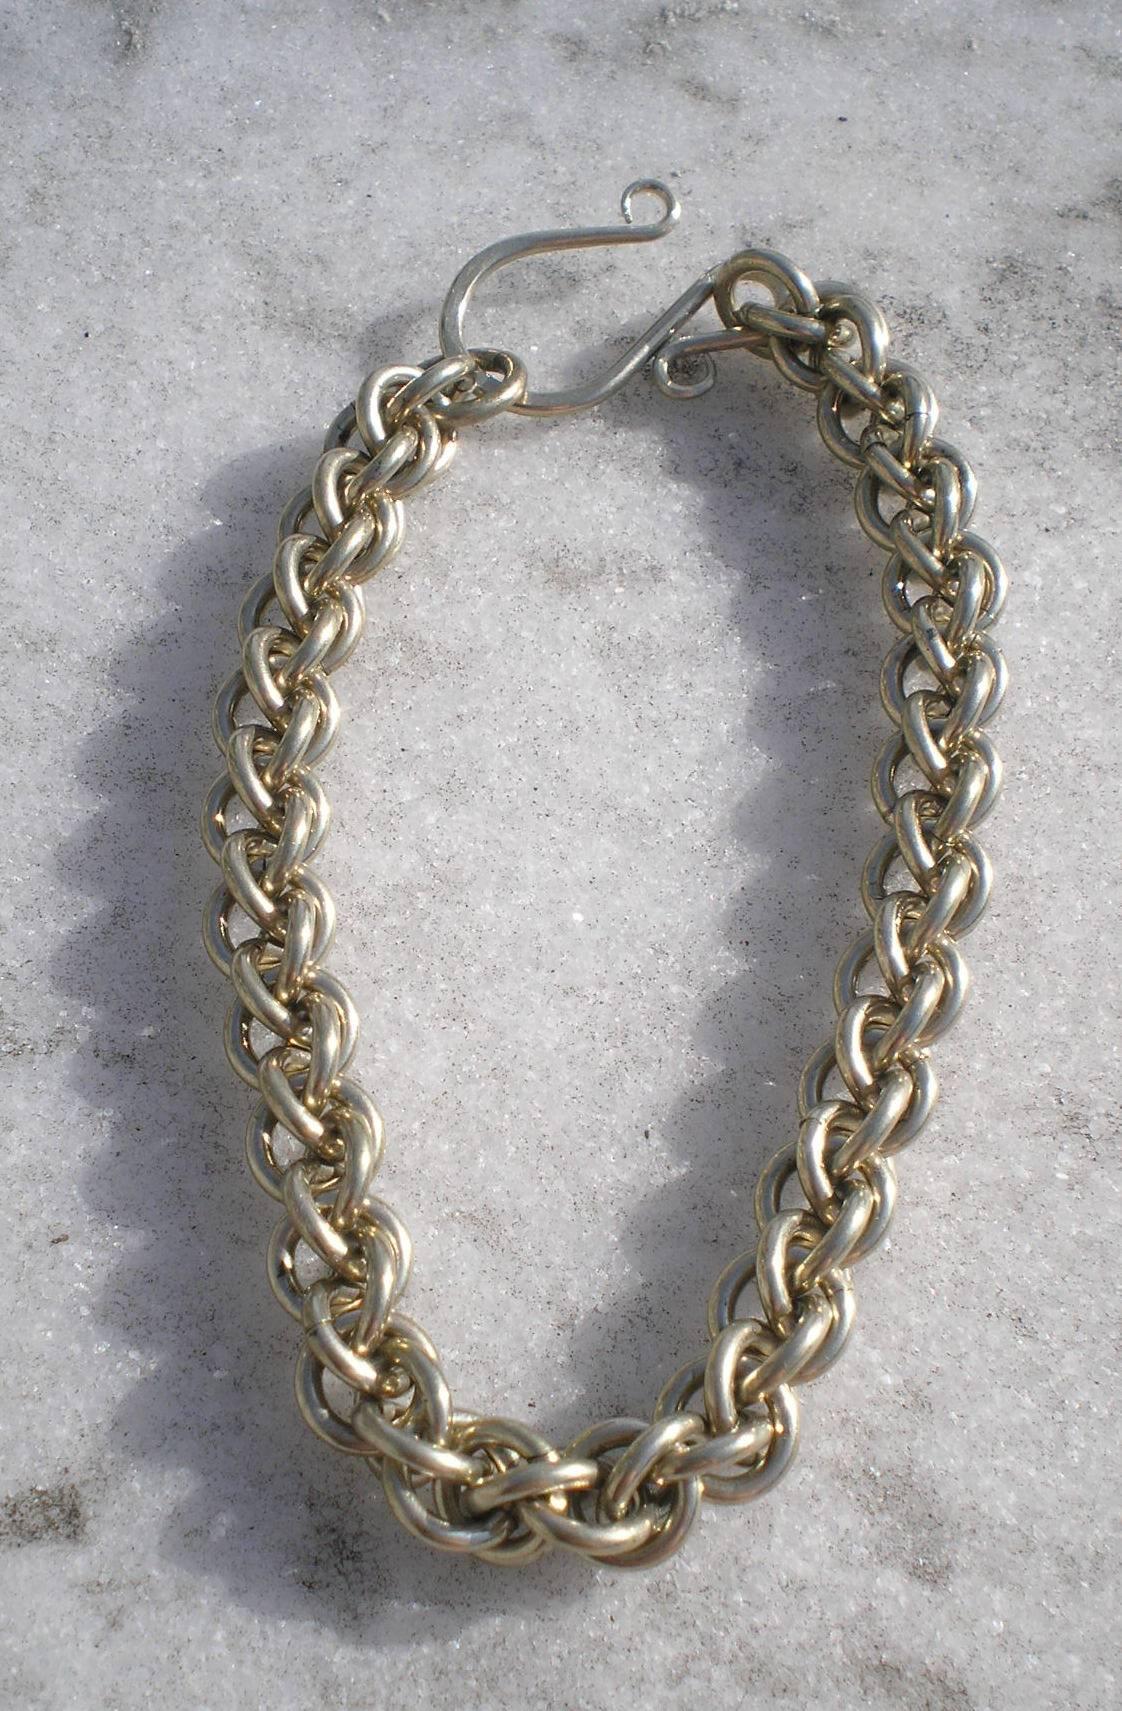 Nickel Silver Rope Chain Bracelet